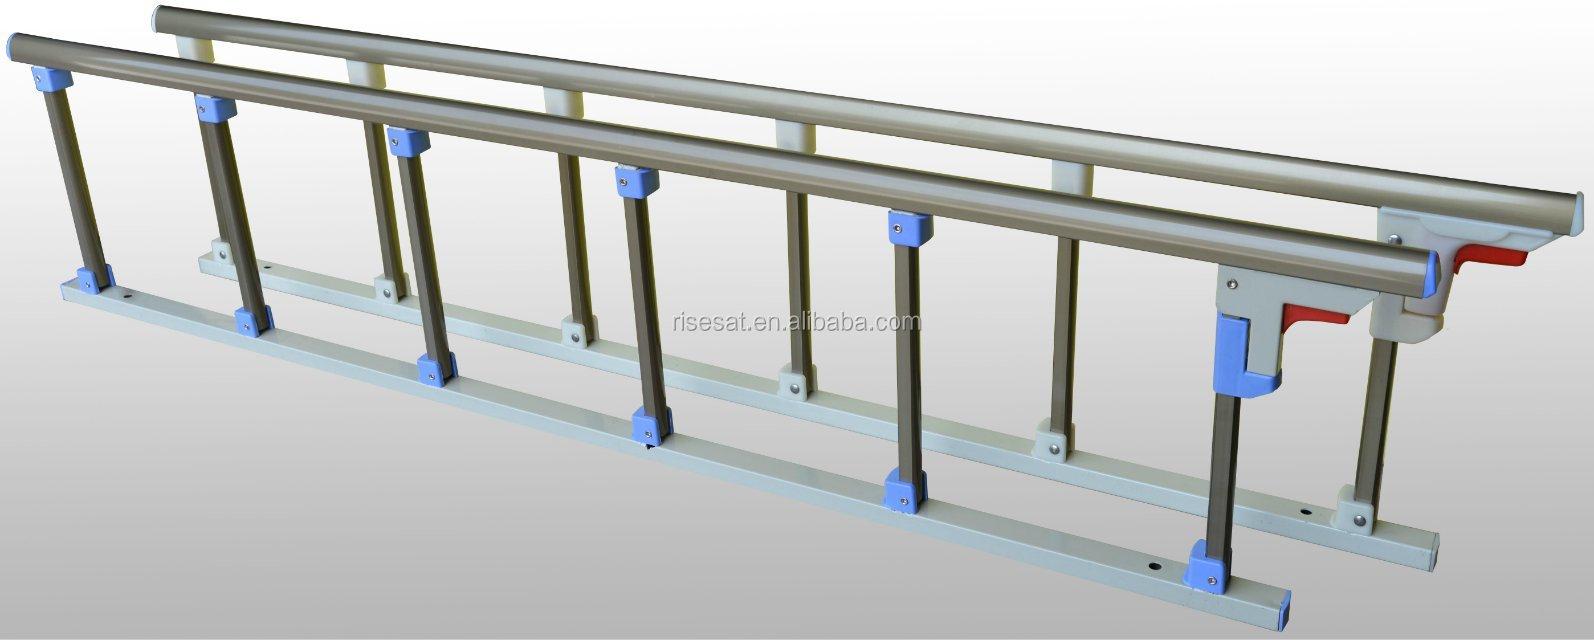 List Manufacturers Of Hospital Bed Side Rails Buy